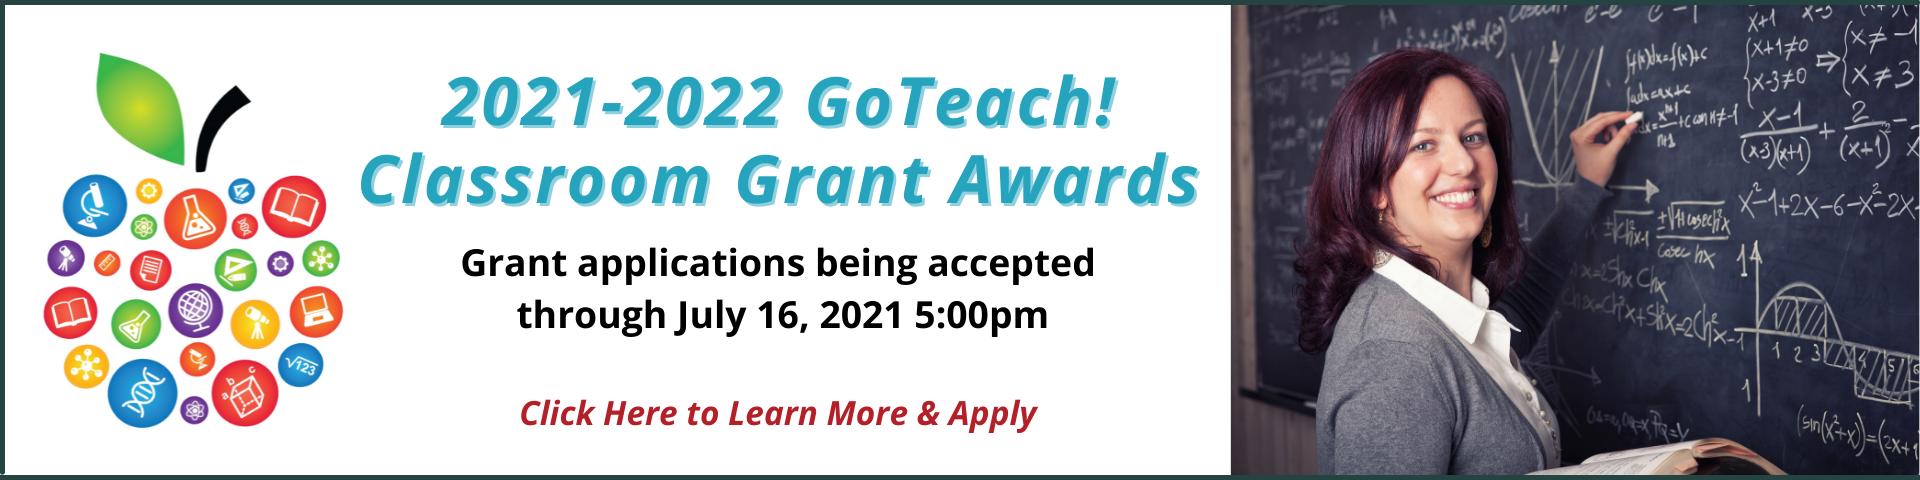 GoTeach! Classroom Grant Award application accepted through July 16, 2021